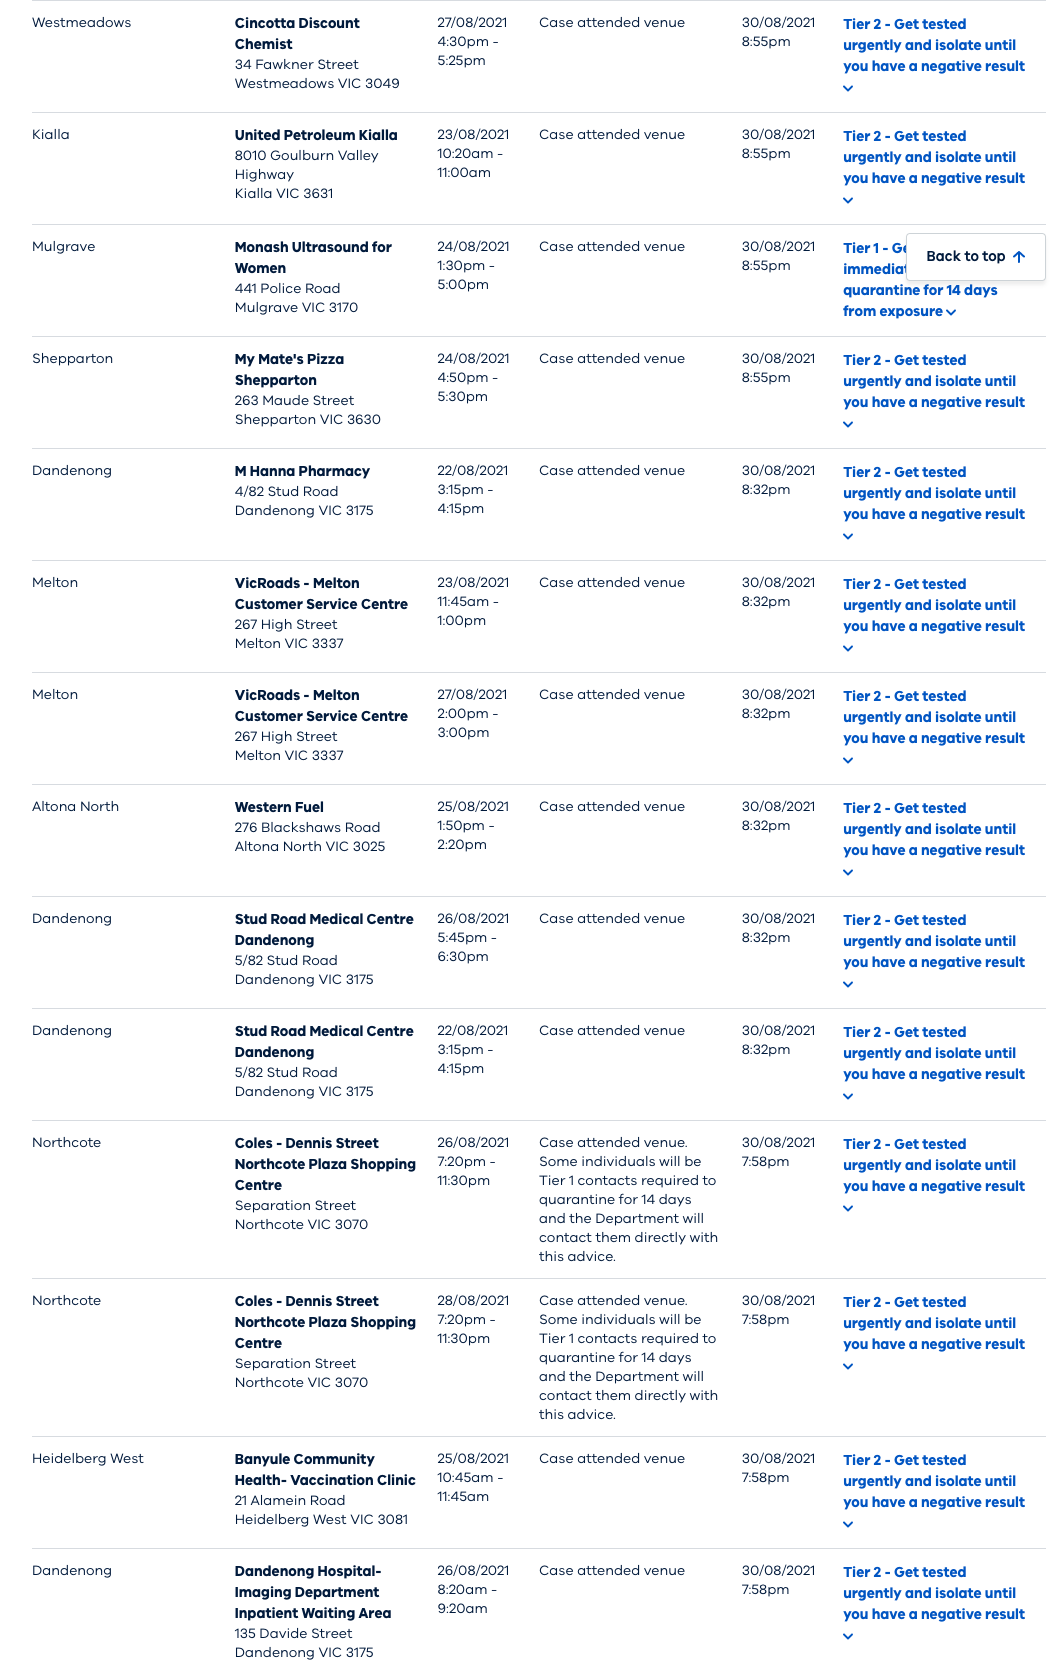 www.coronavirus.vic.gov.au_exposure-sites (24)的副本.png